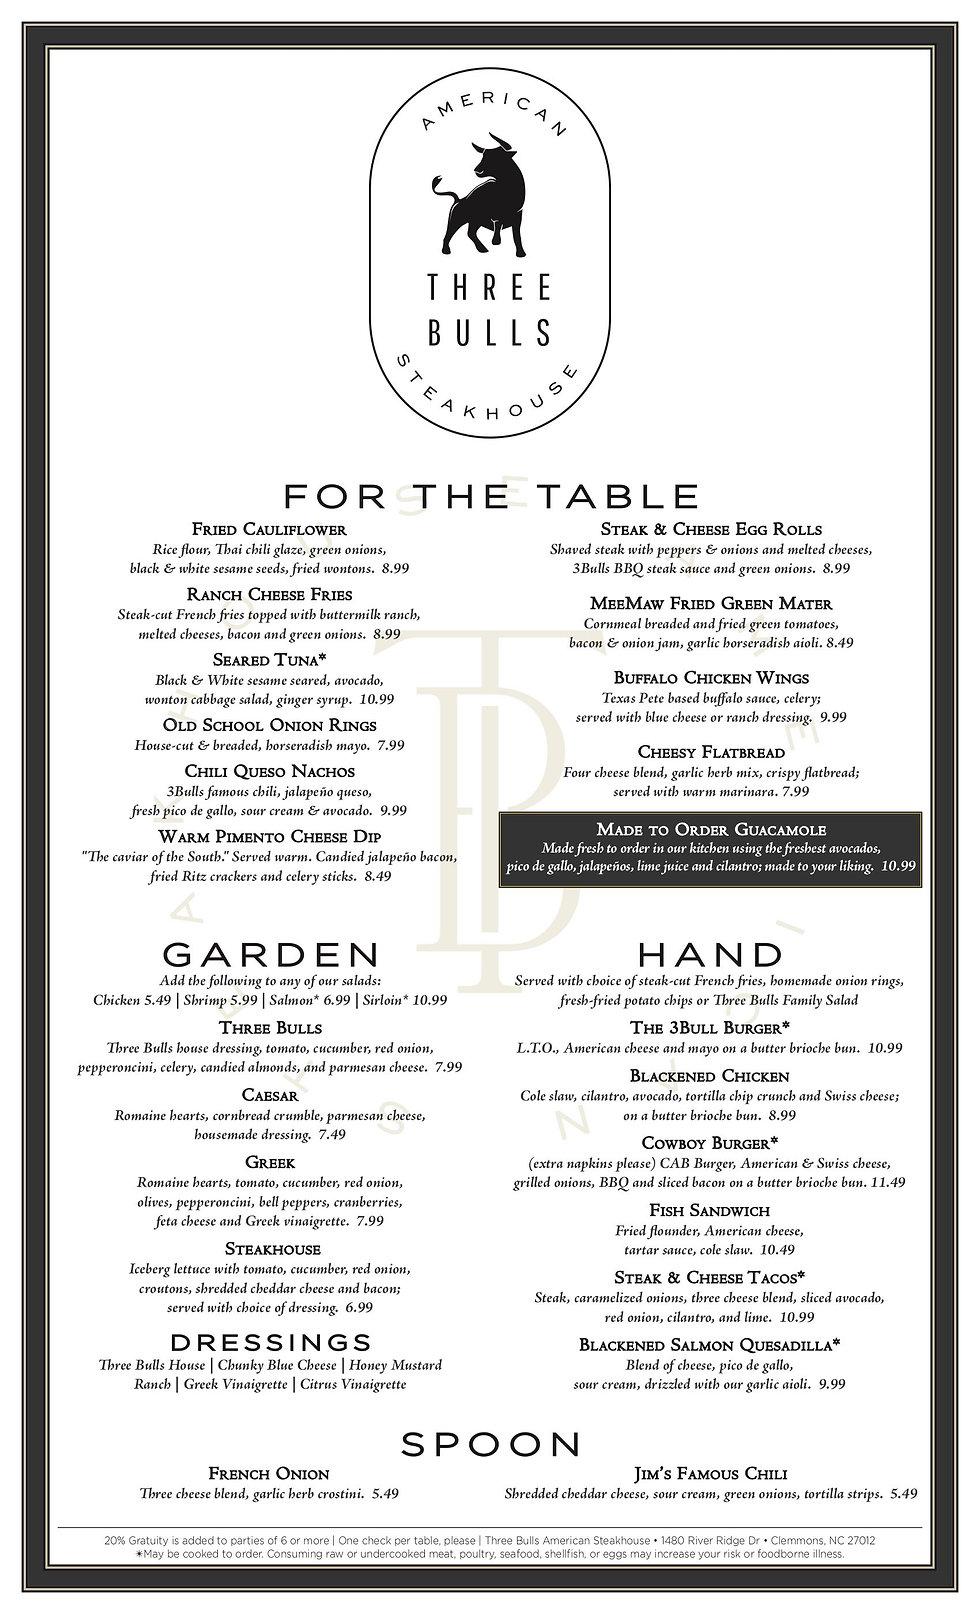 ThreeBulls_Dinner1.jpg